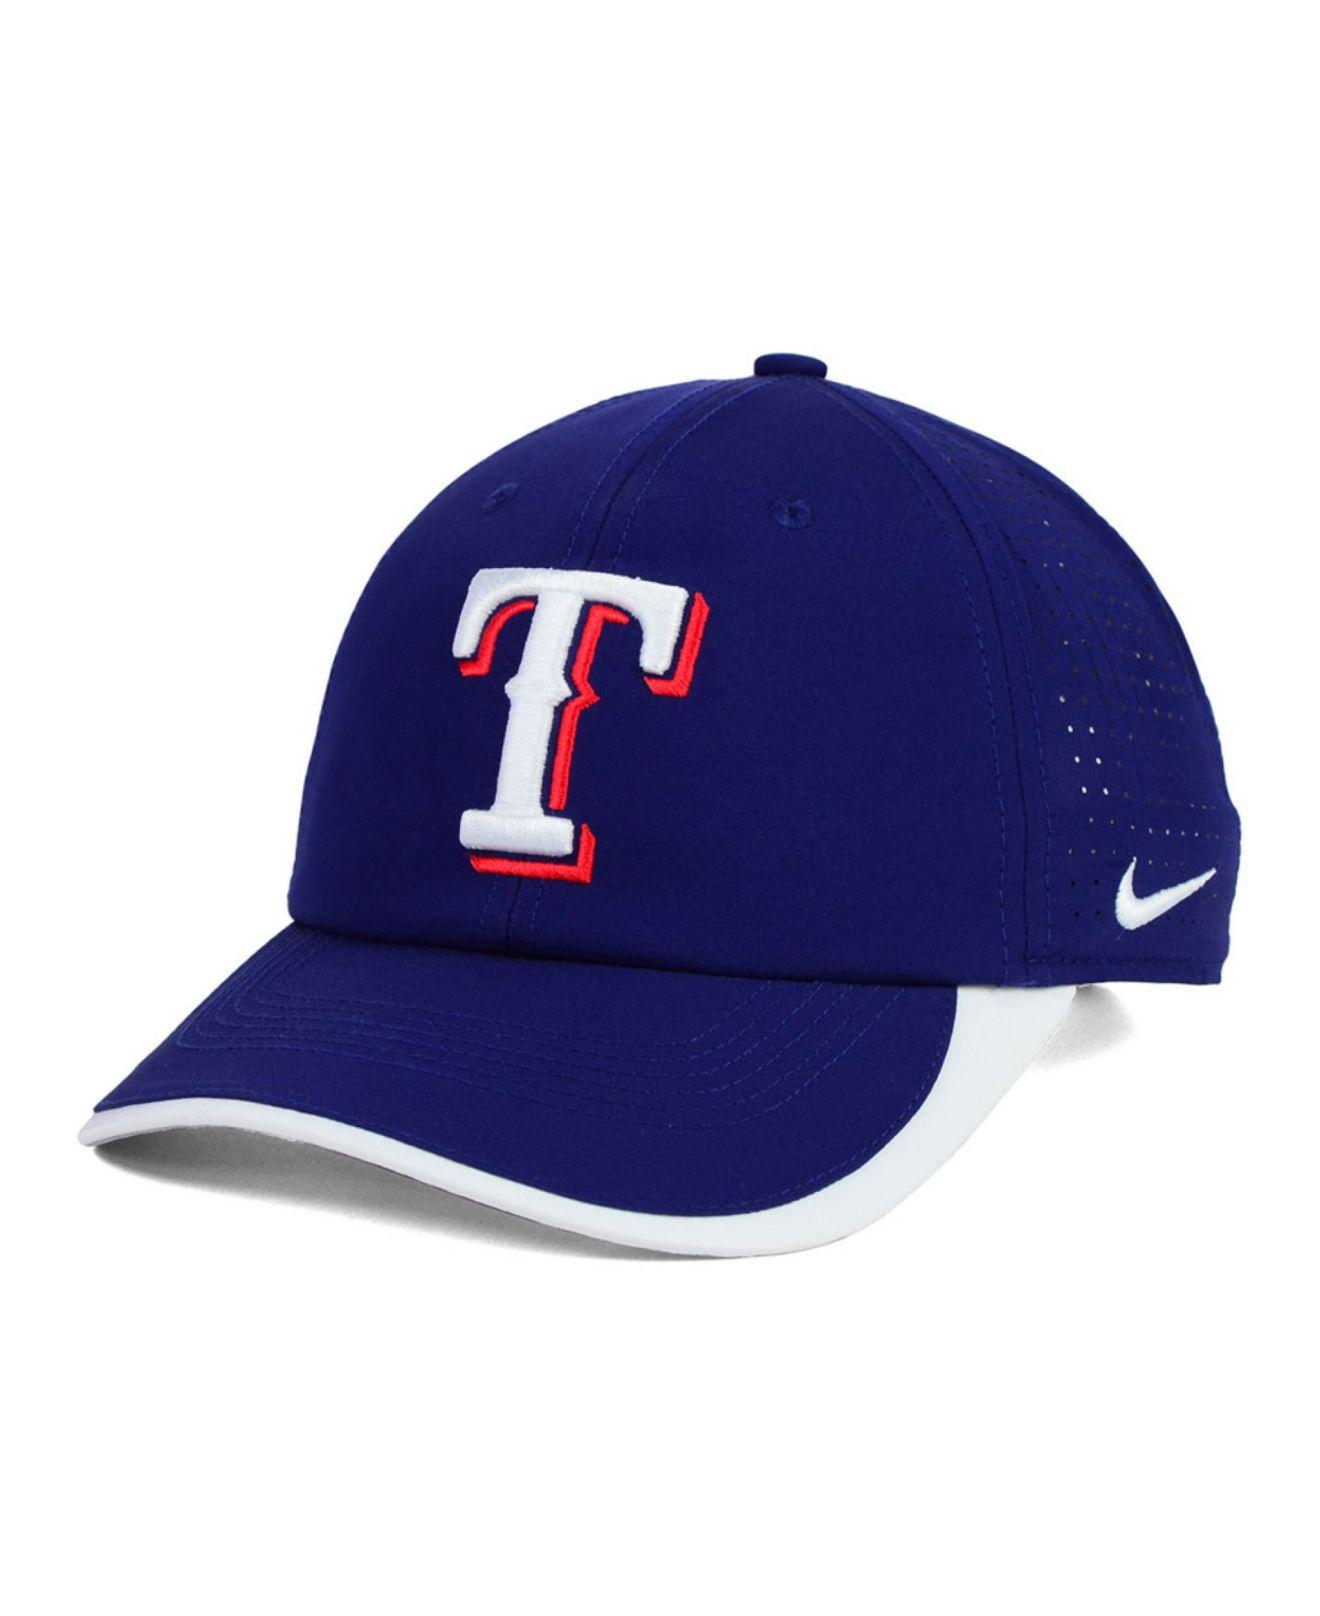 0277128c4f7f5 Lyst - Nike Texas Rangers Featherlite Cap in Blue for Men